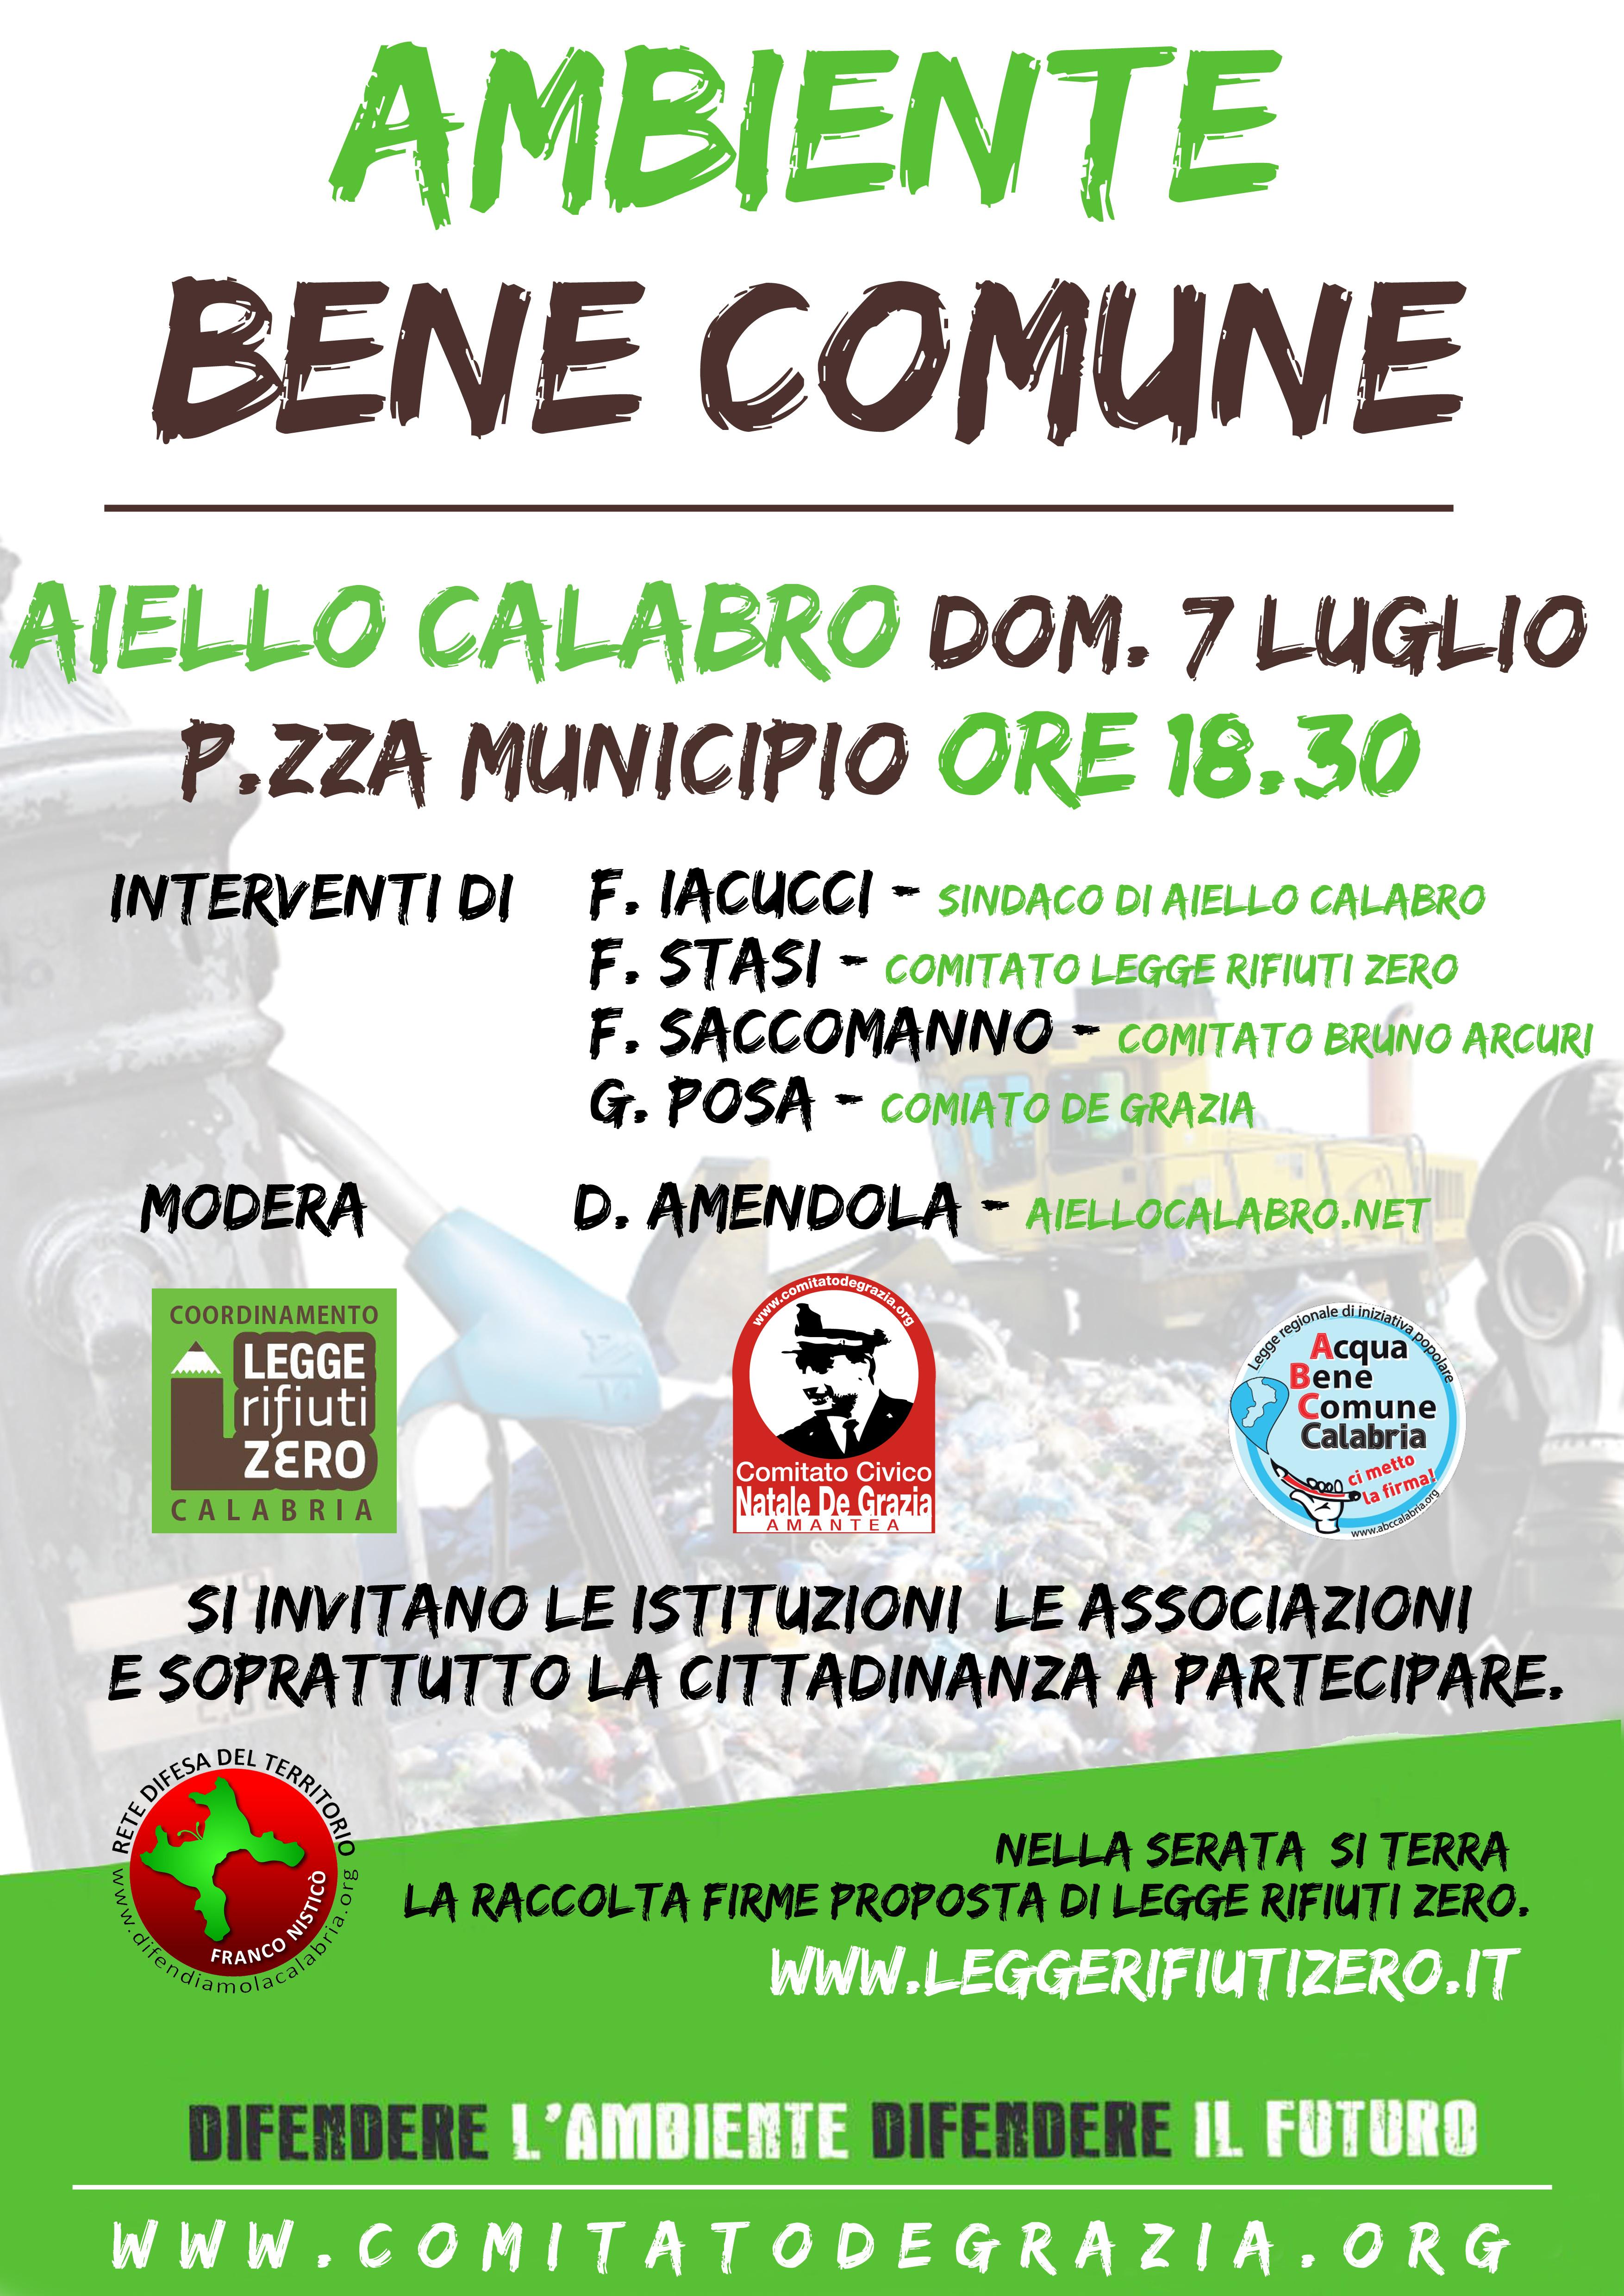 Thumbnail image for http://www.aiellocalabro.net/eventi/ambientebenecomune/IniziativaAmbienteBeneComuneAielloCalabro2013.jpg